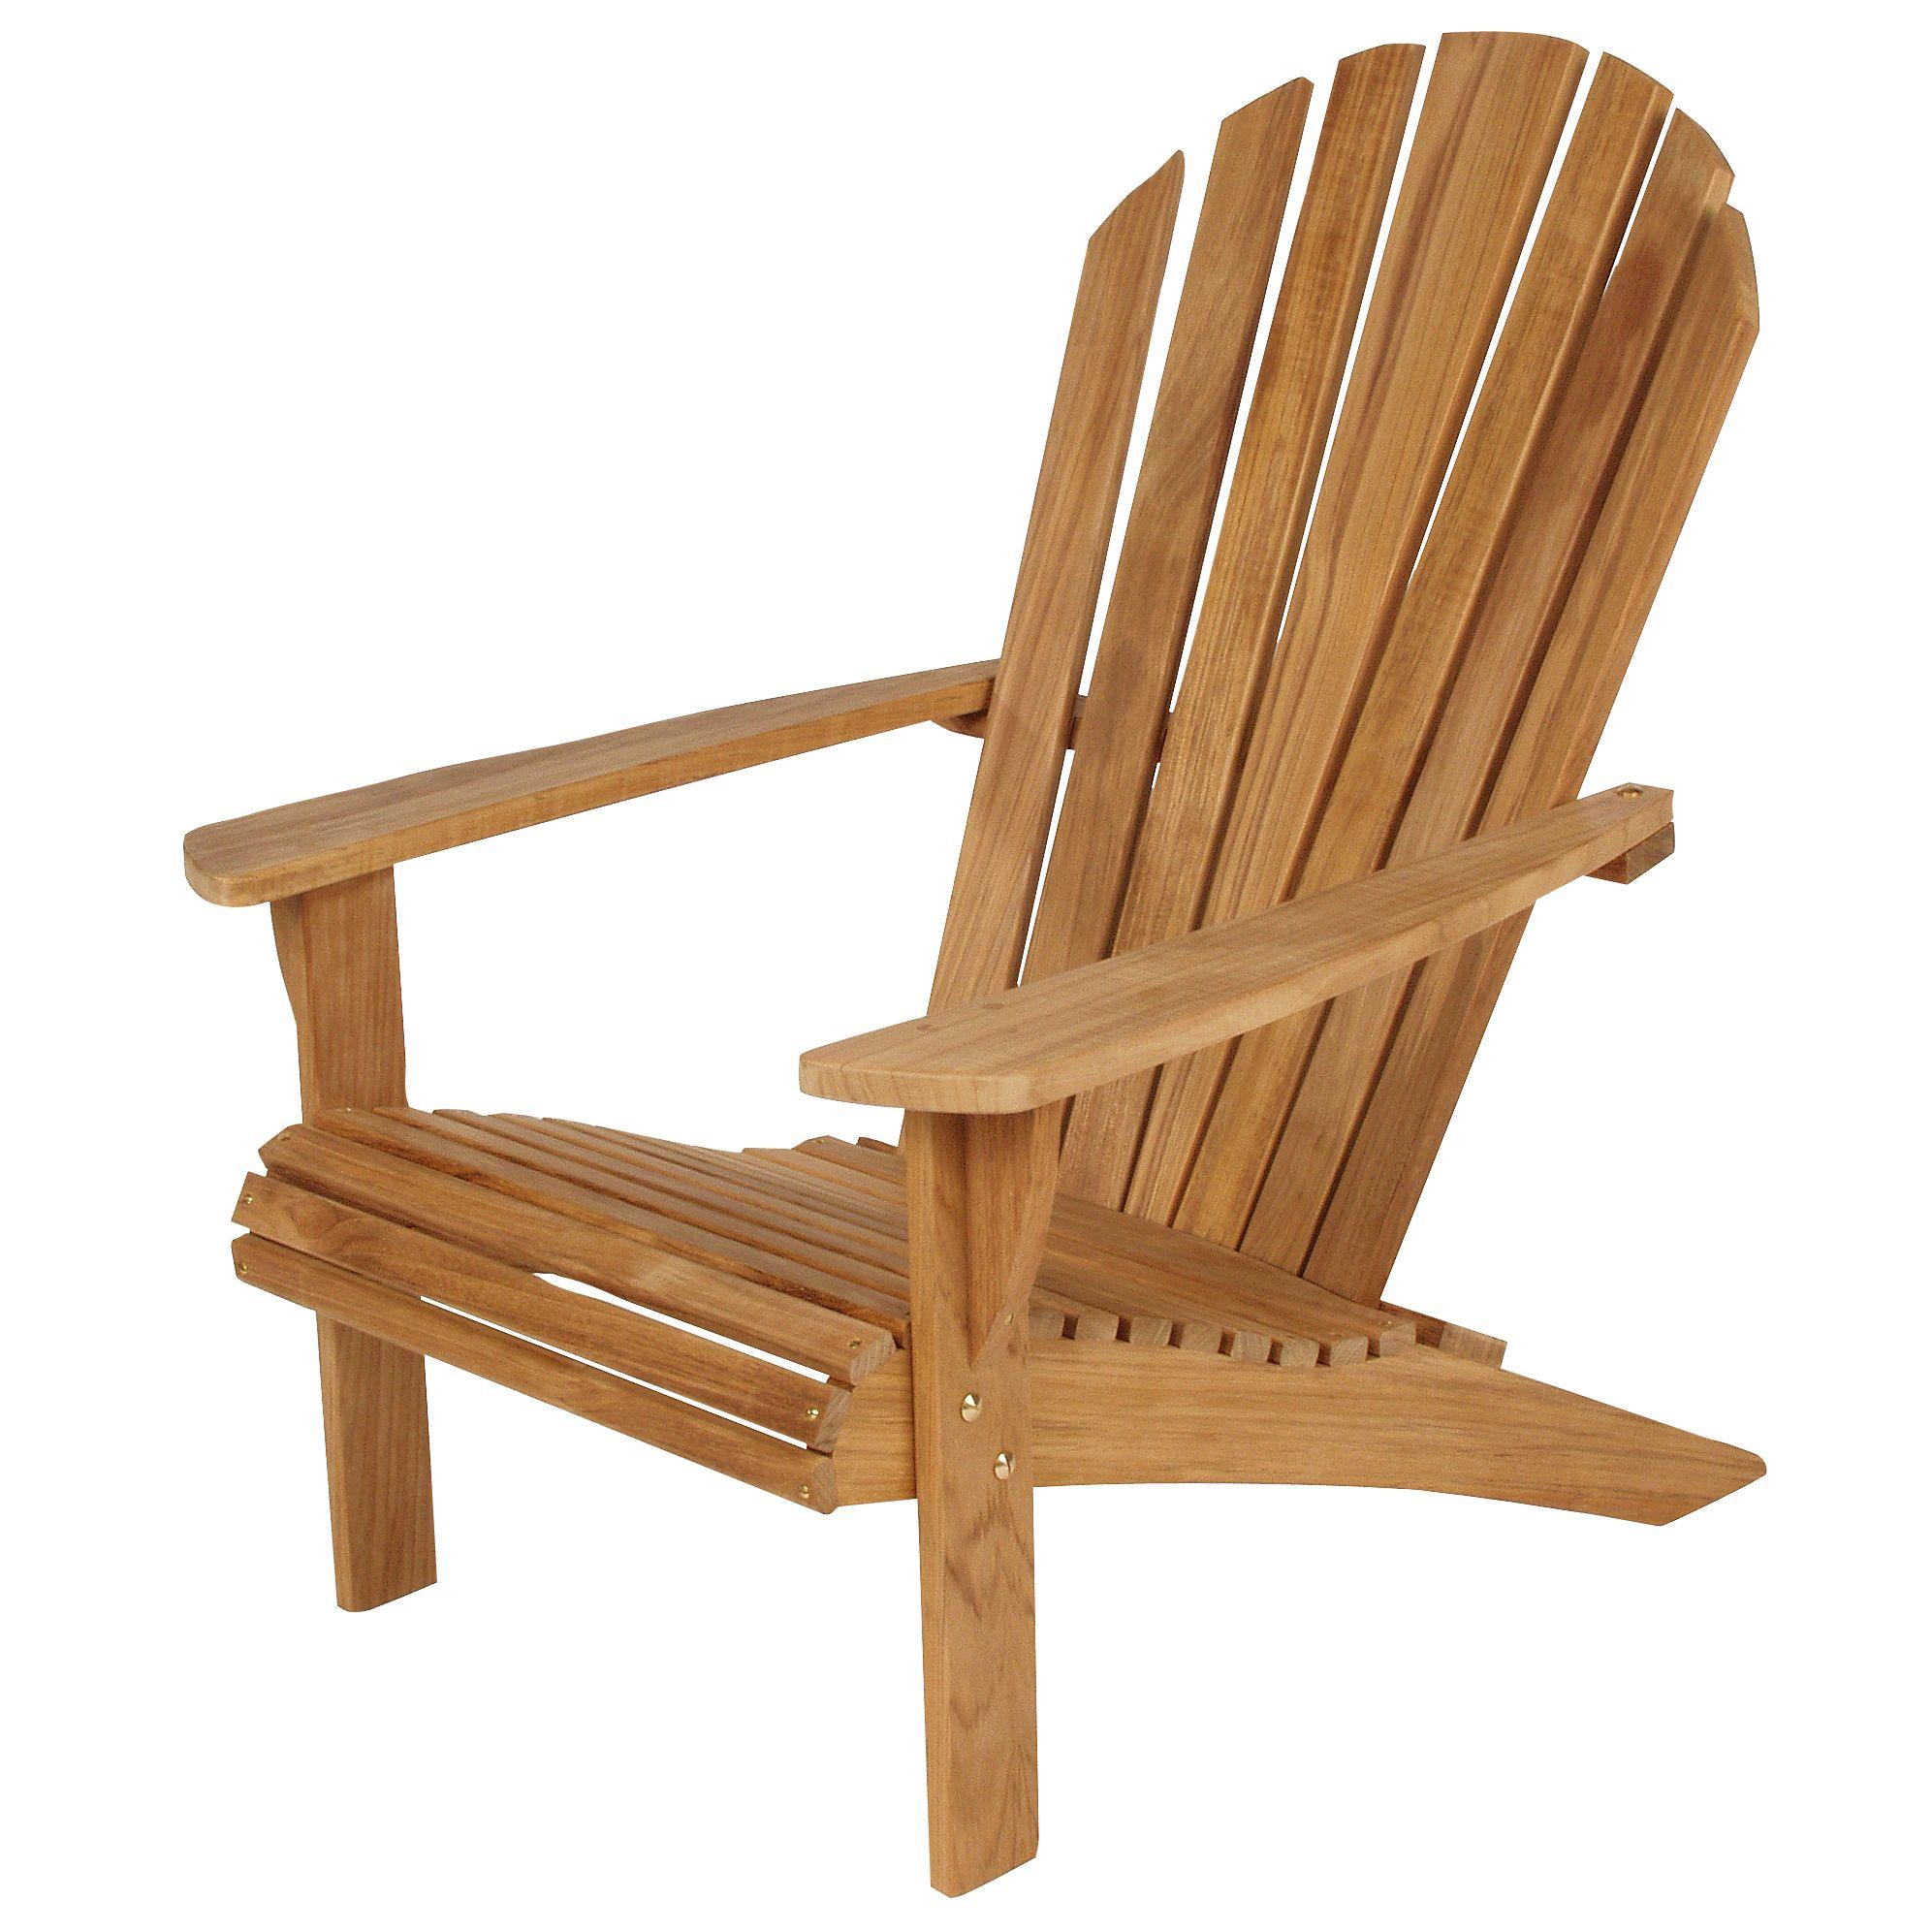 Barlow Tyrie Adironack Armchair